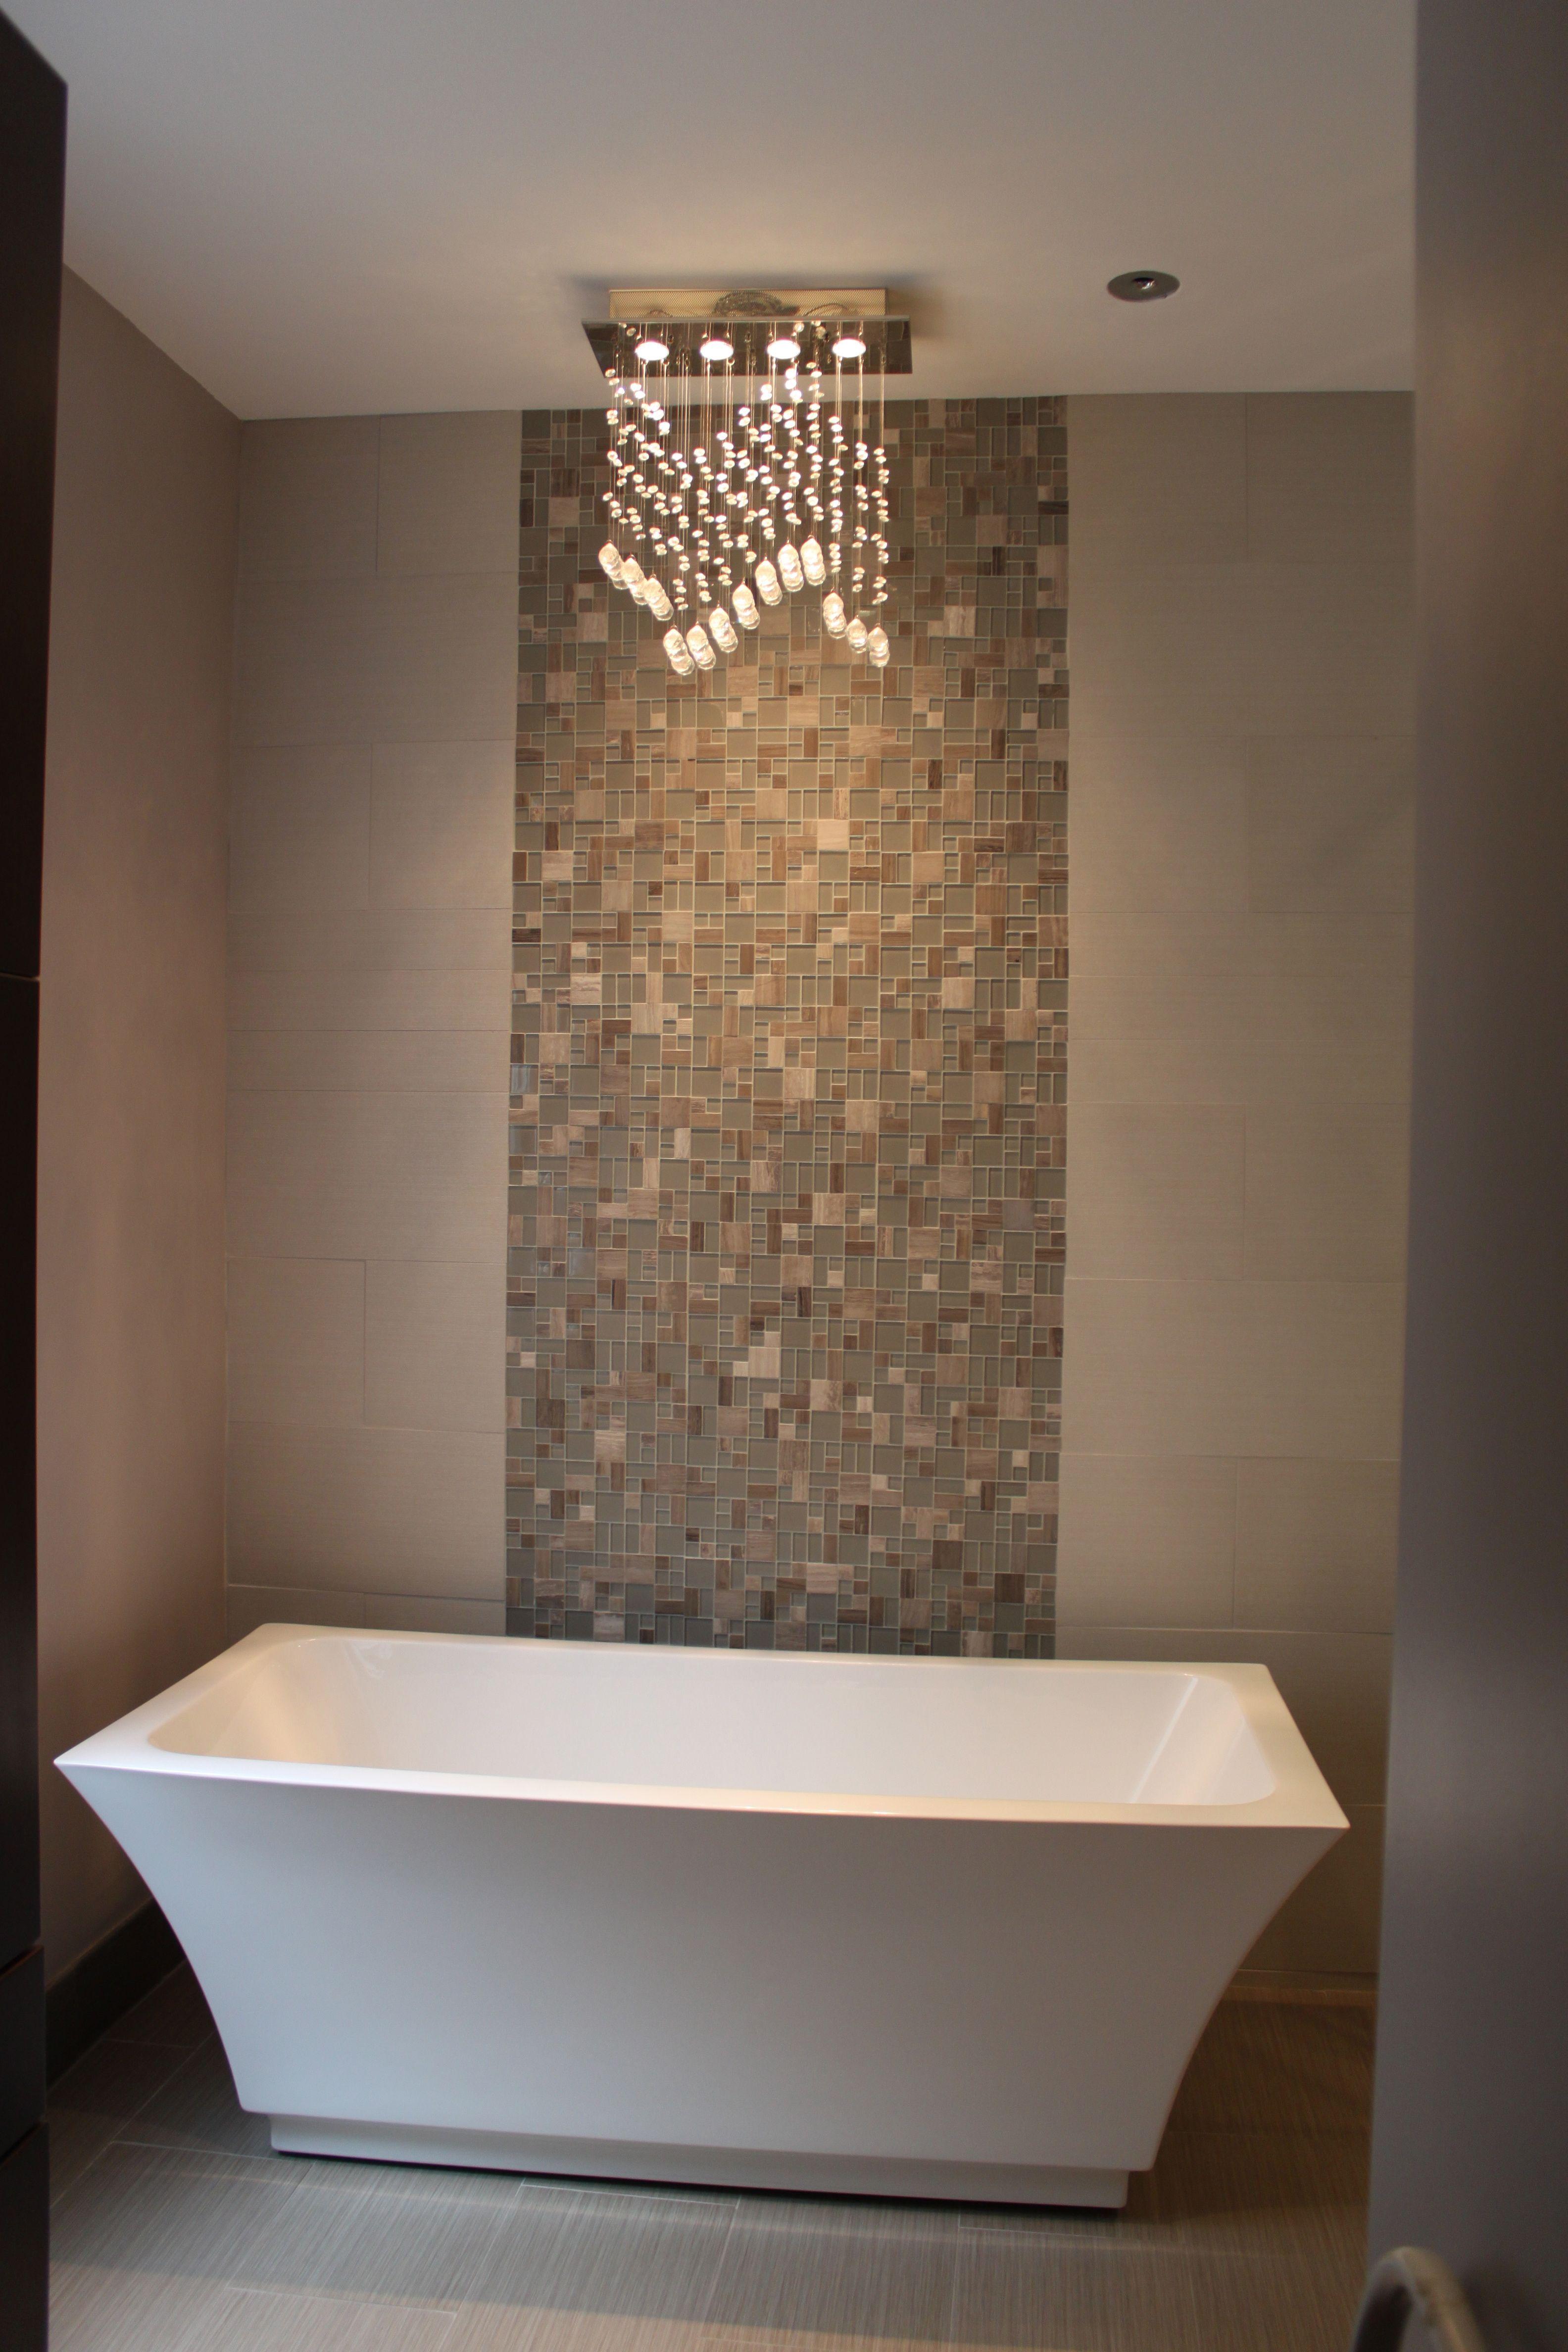 Freestanding Bathtub with Kohler ceiling faucet ...